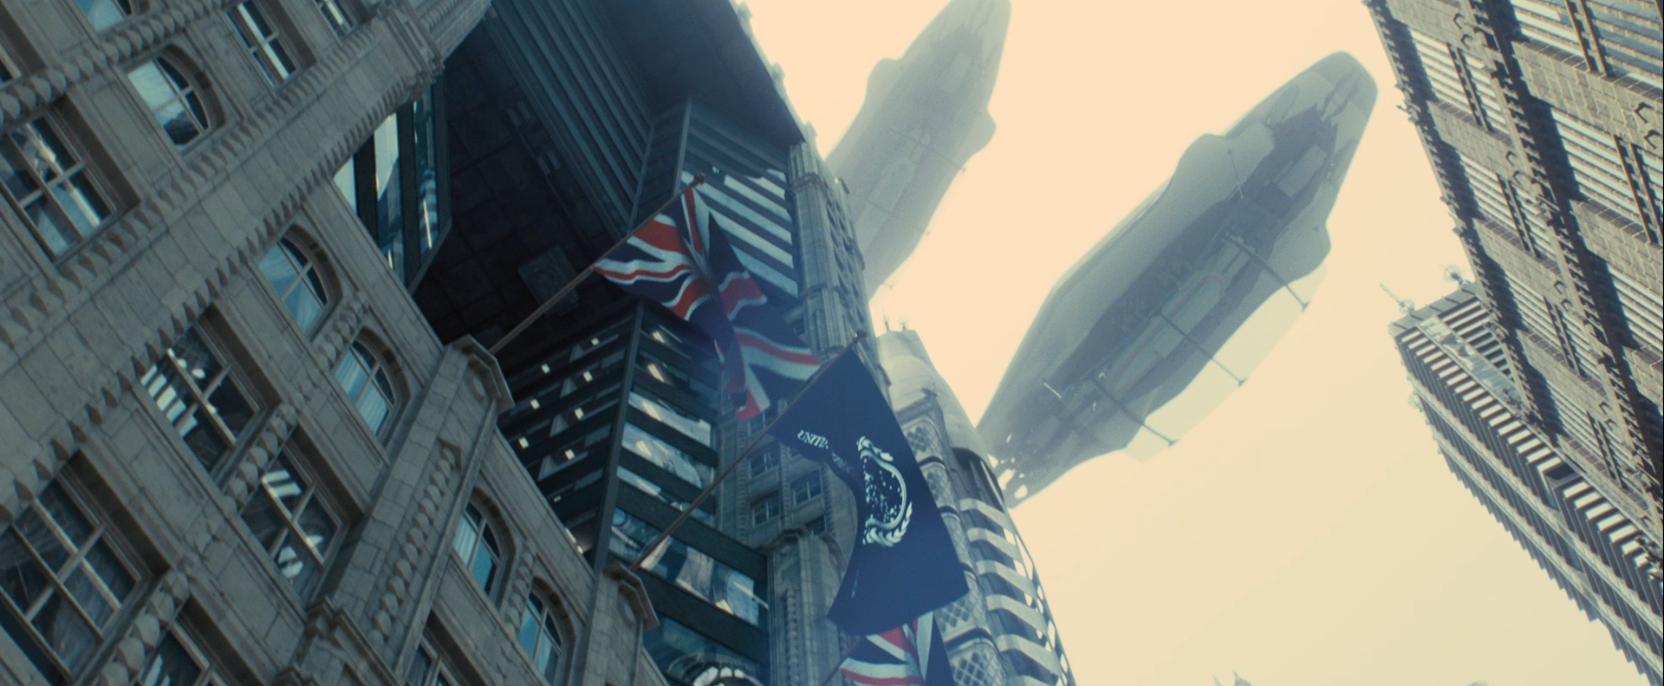 Future London in Star Trek Into Darkness